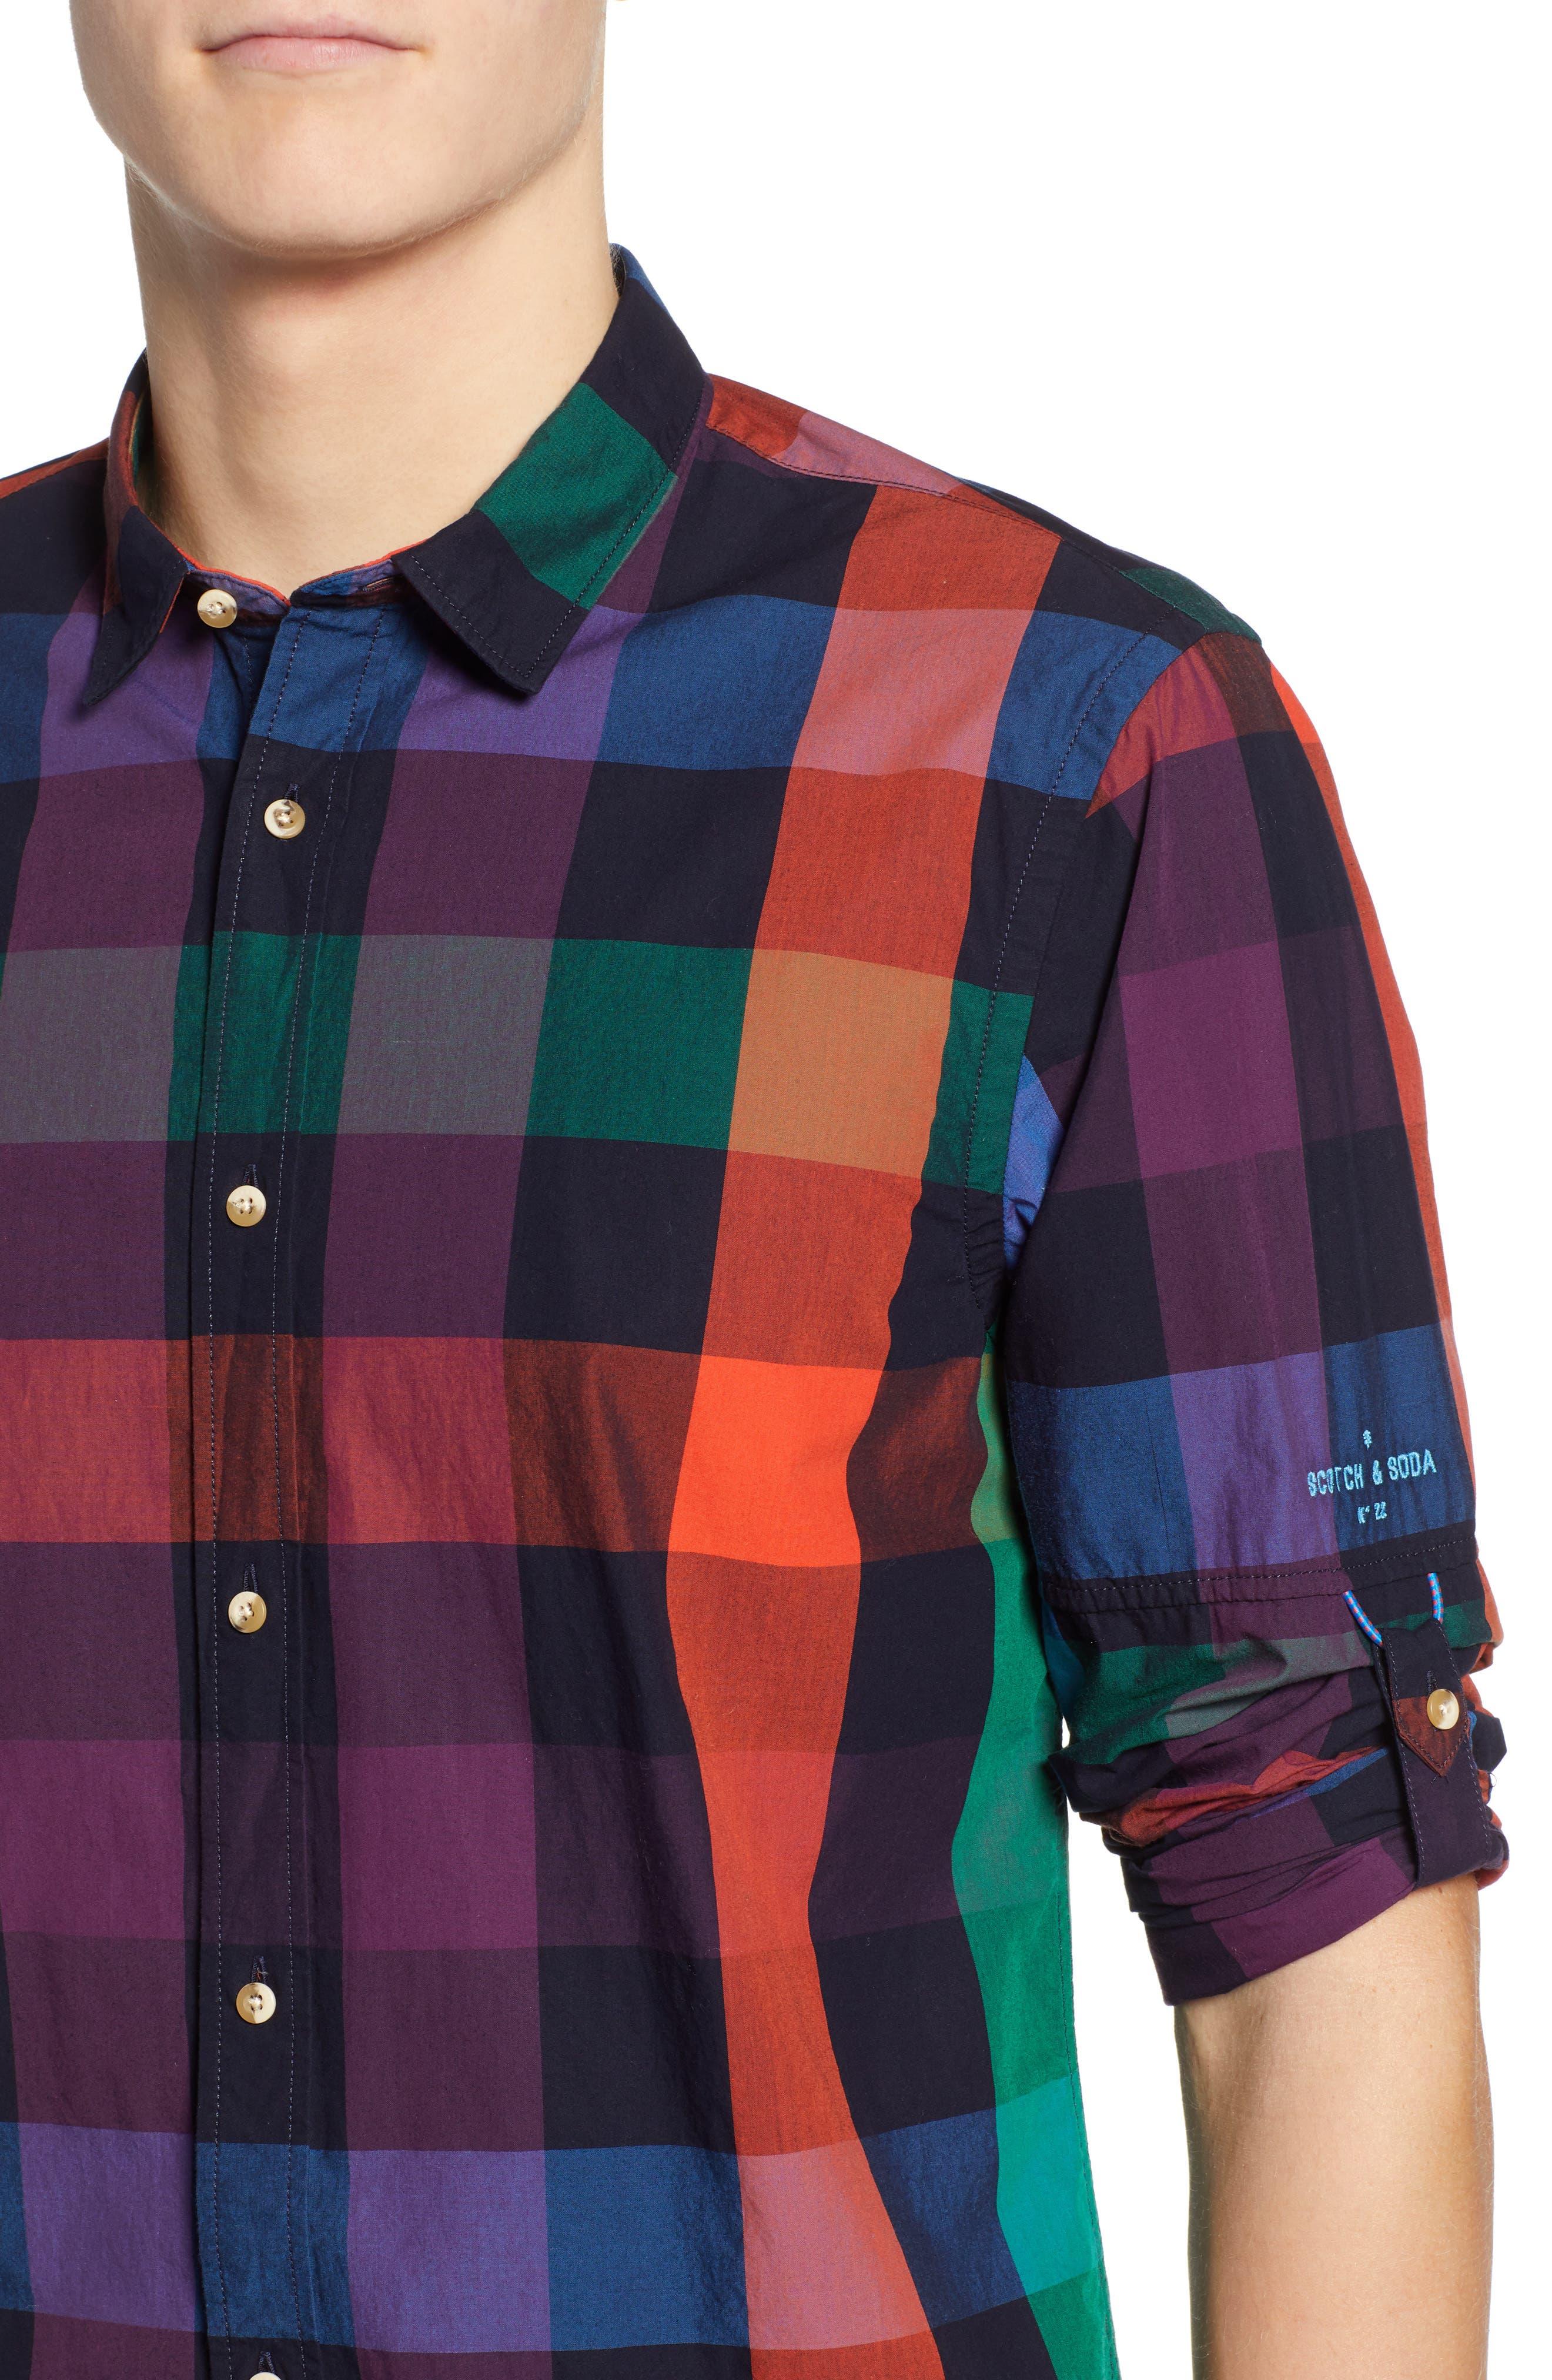 SCOTCH & SODA,                             Check Sport Shirt,                             Alternate thumbnail 4, color,                             300